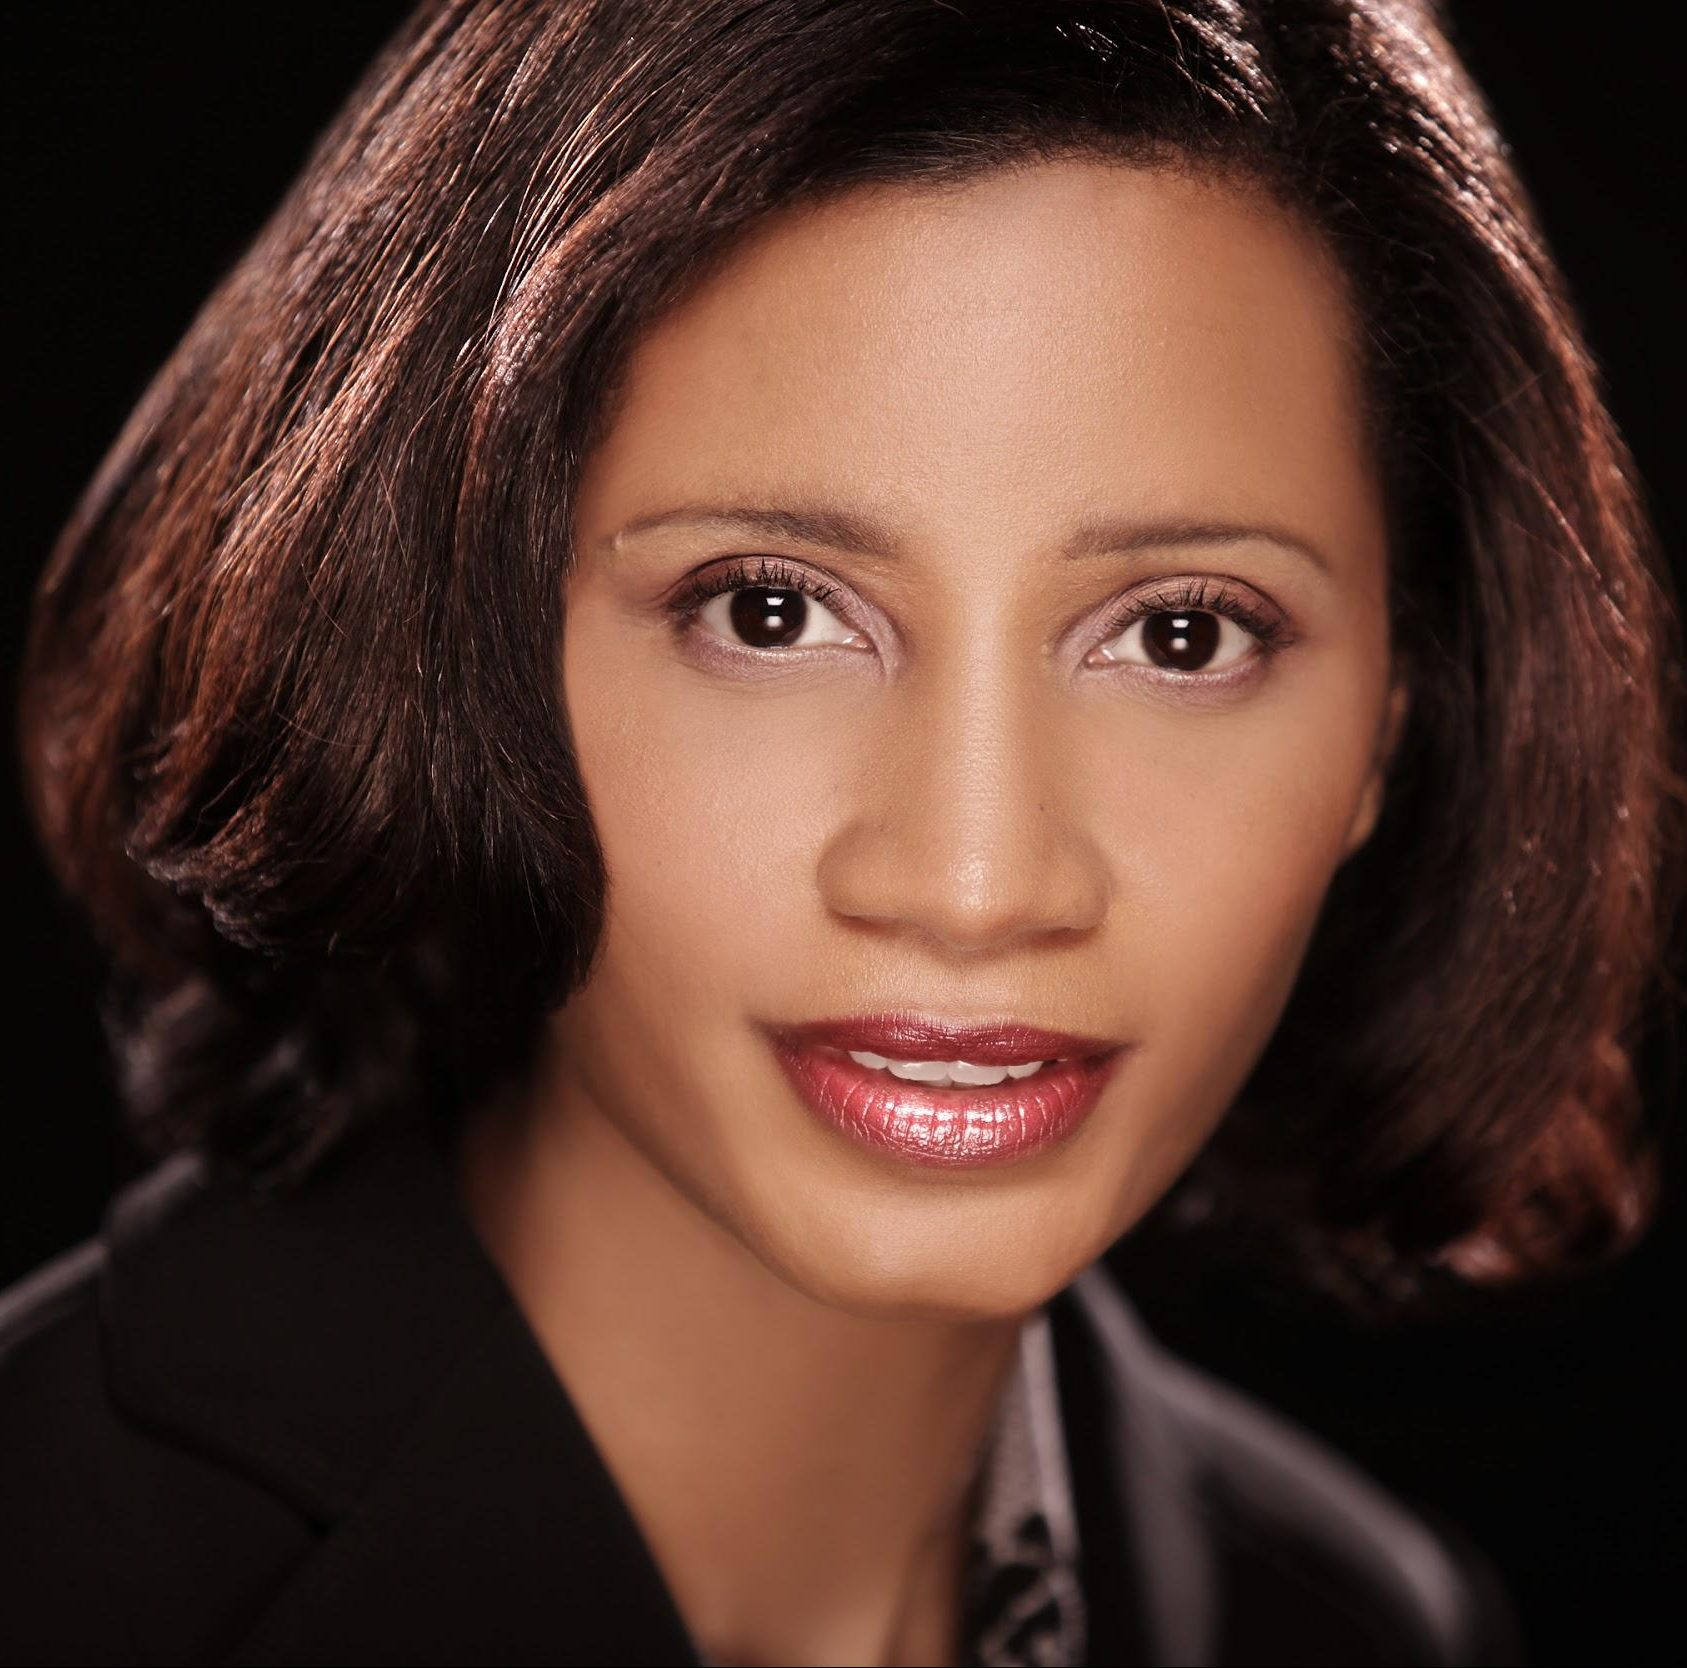 Harrine Freeman, H.E. Freeman Enterprises, LLC - financial goals - Tips from the Pros